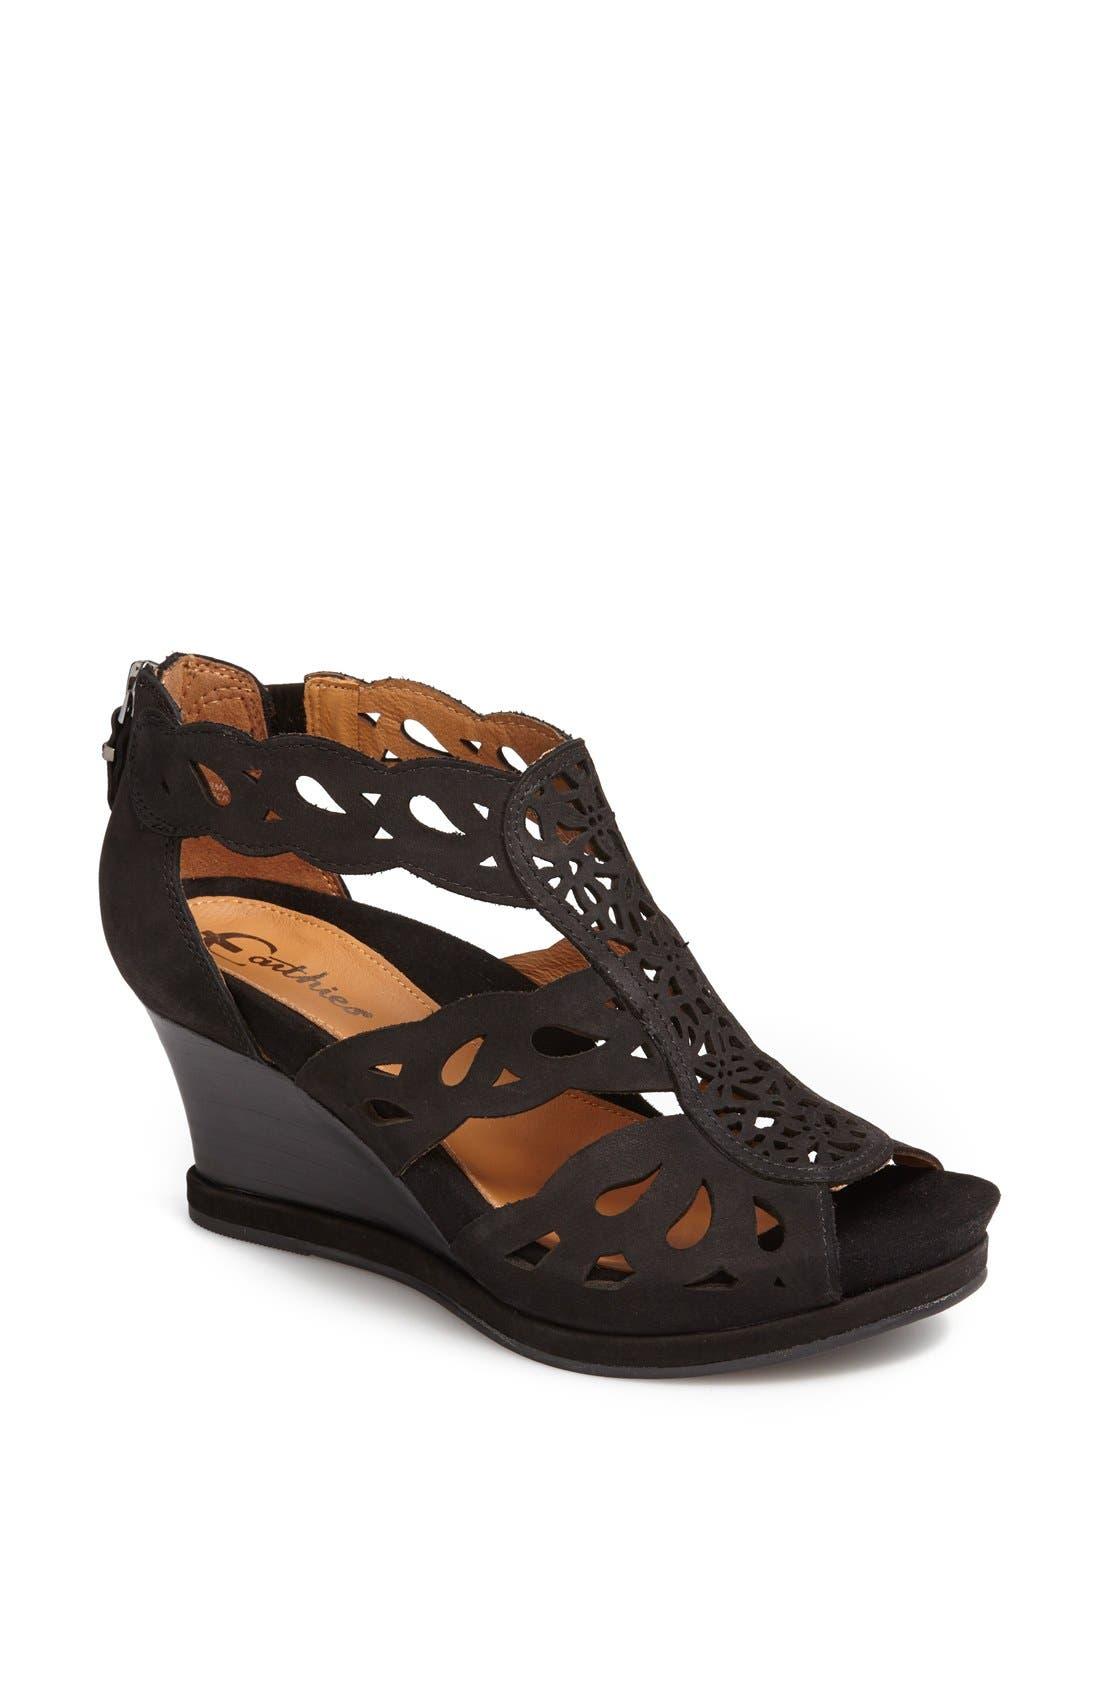 Alternate Image 1 Selected - Earthies® 'Campora' Wedge Sandal